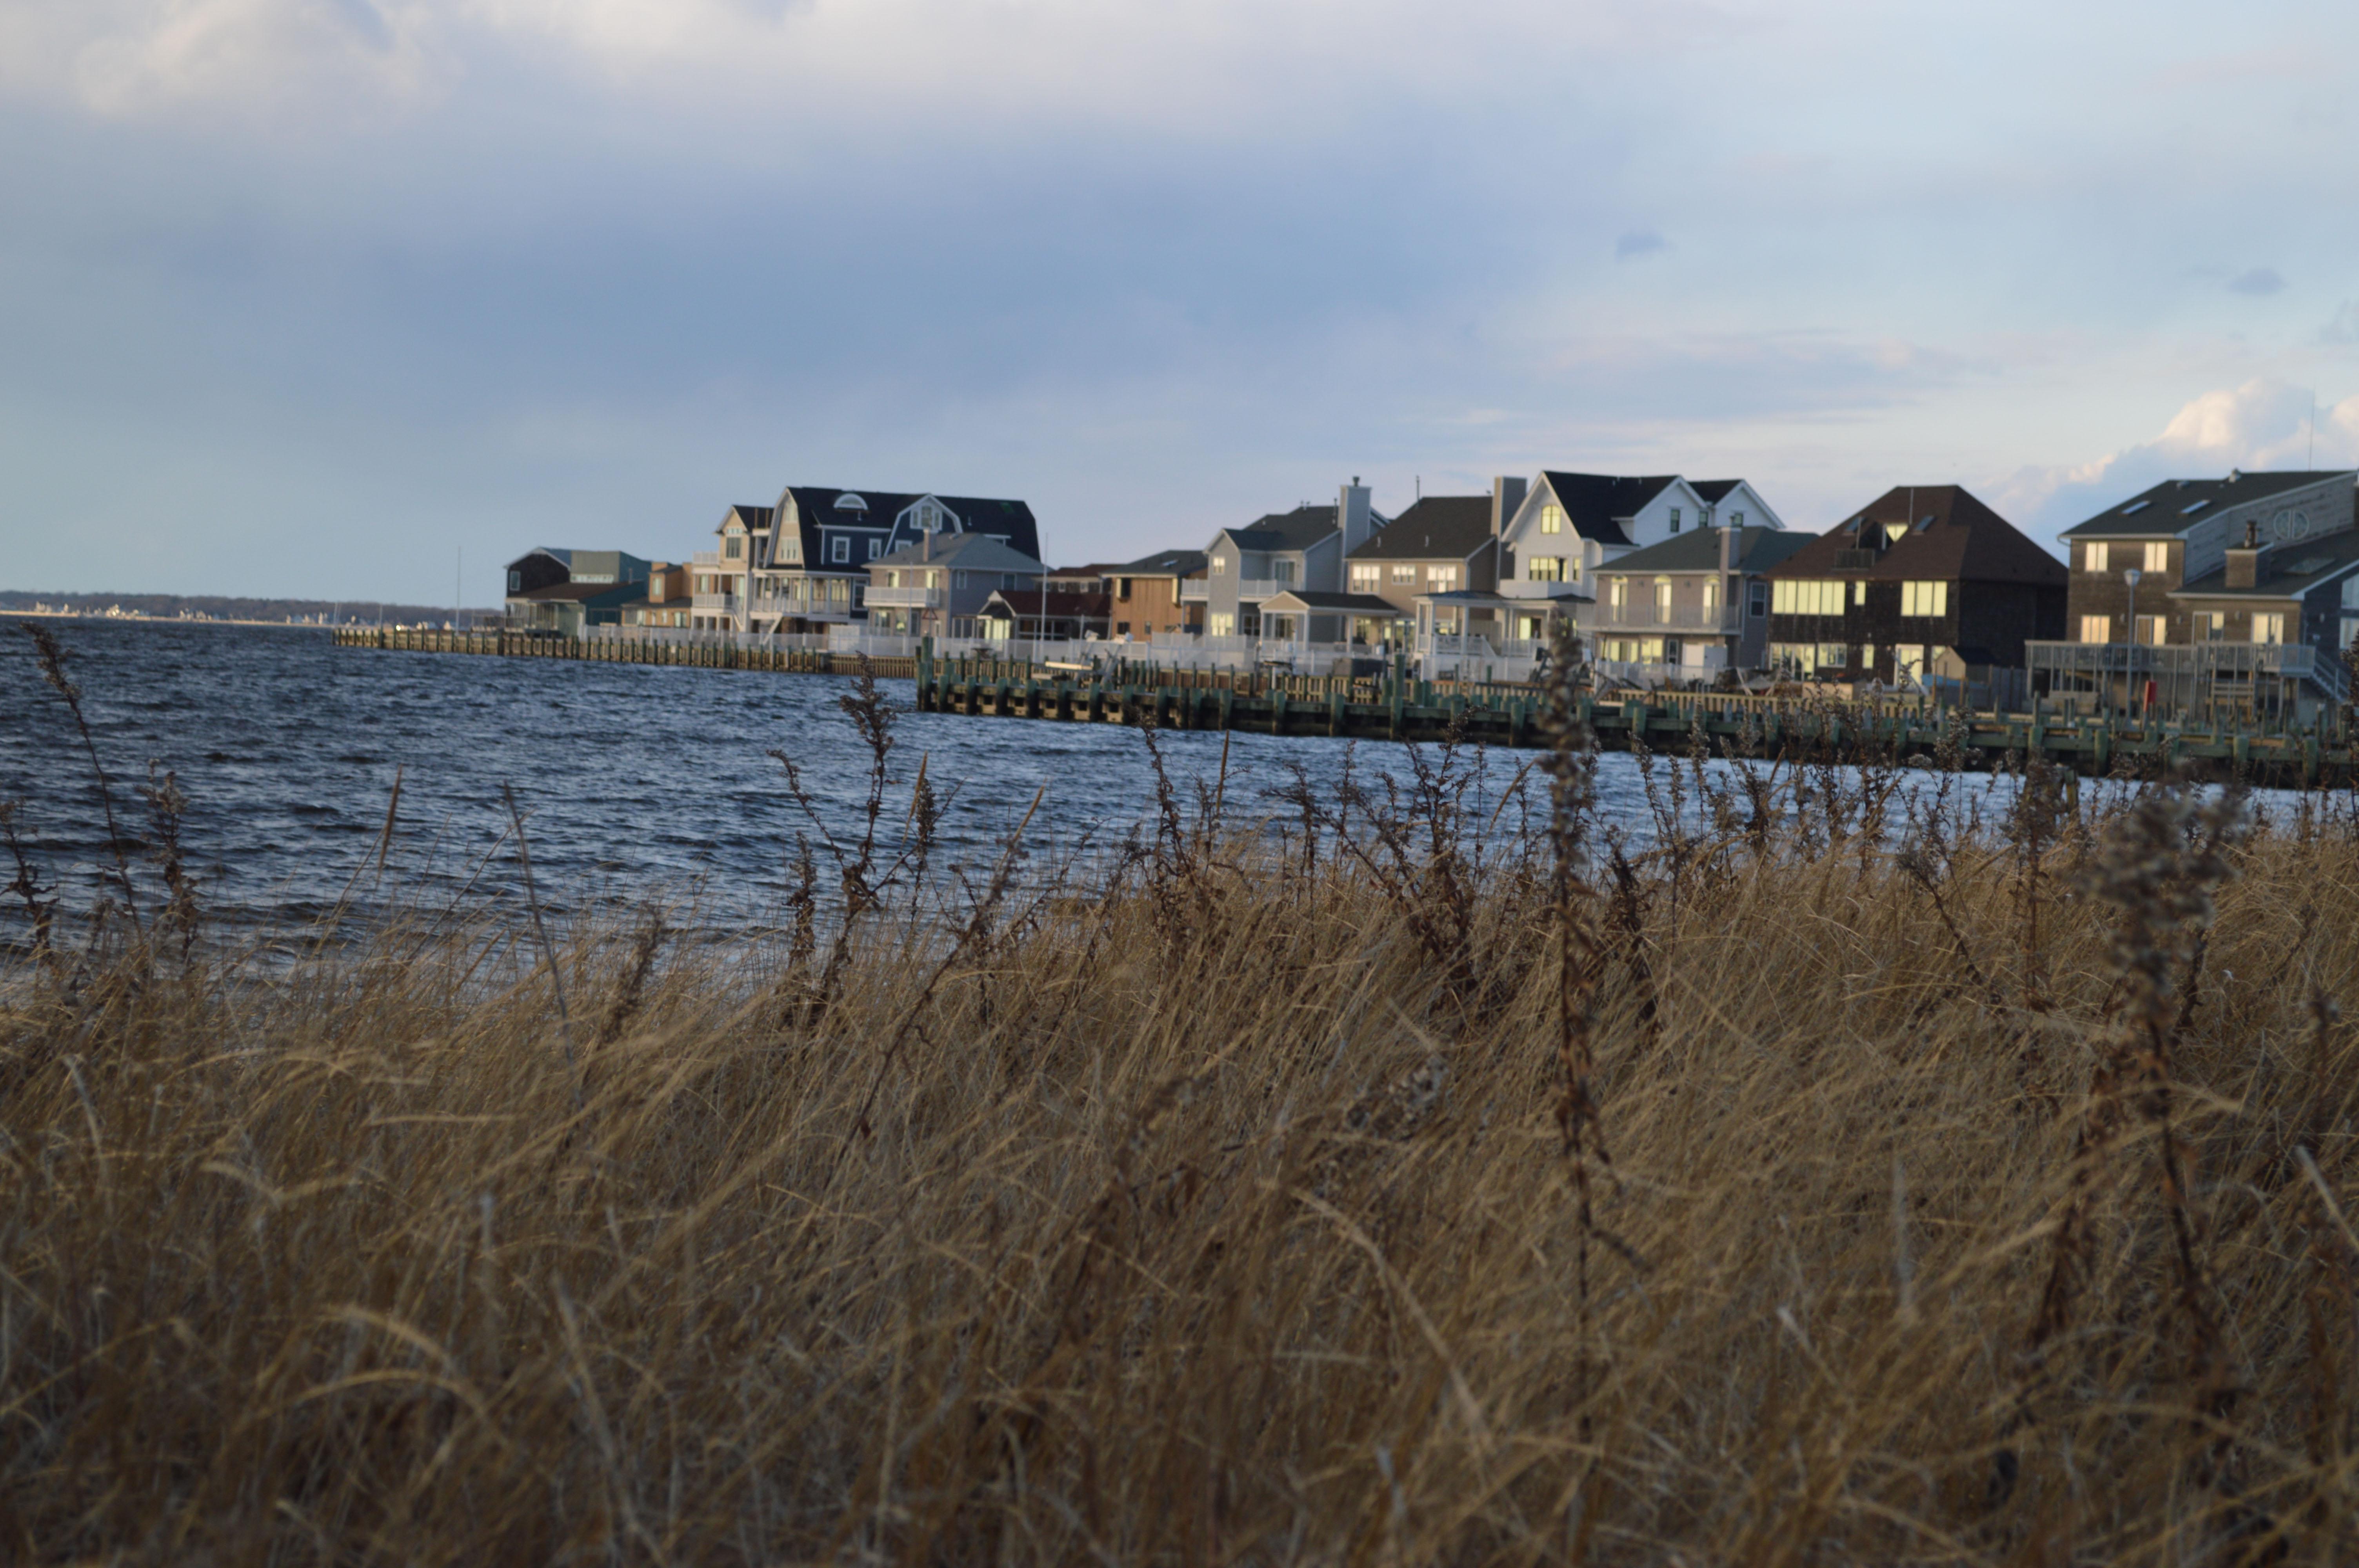 The Seaside Park bayfront. (Photo: Daniel Nee)